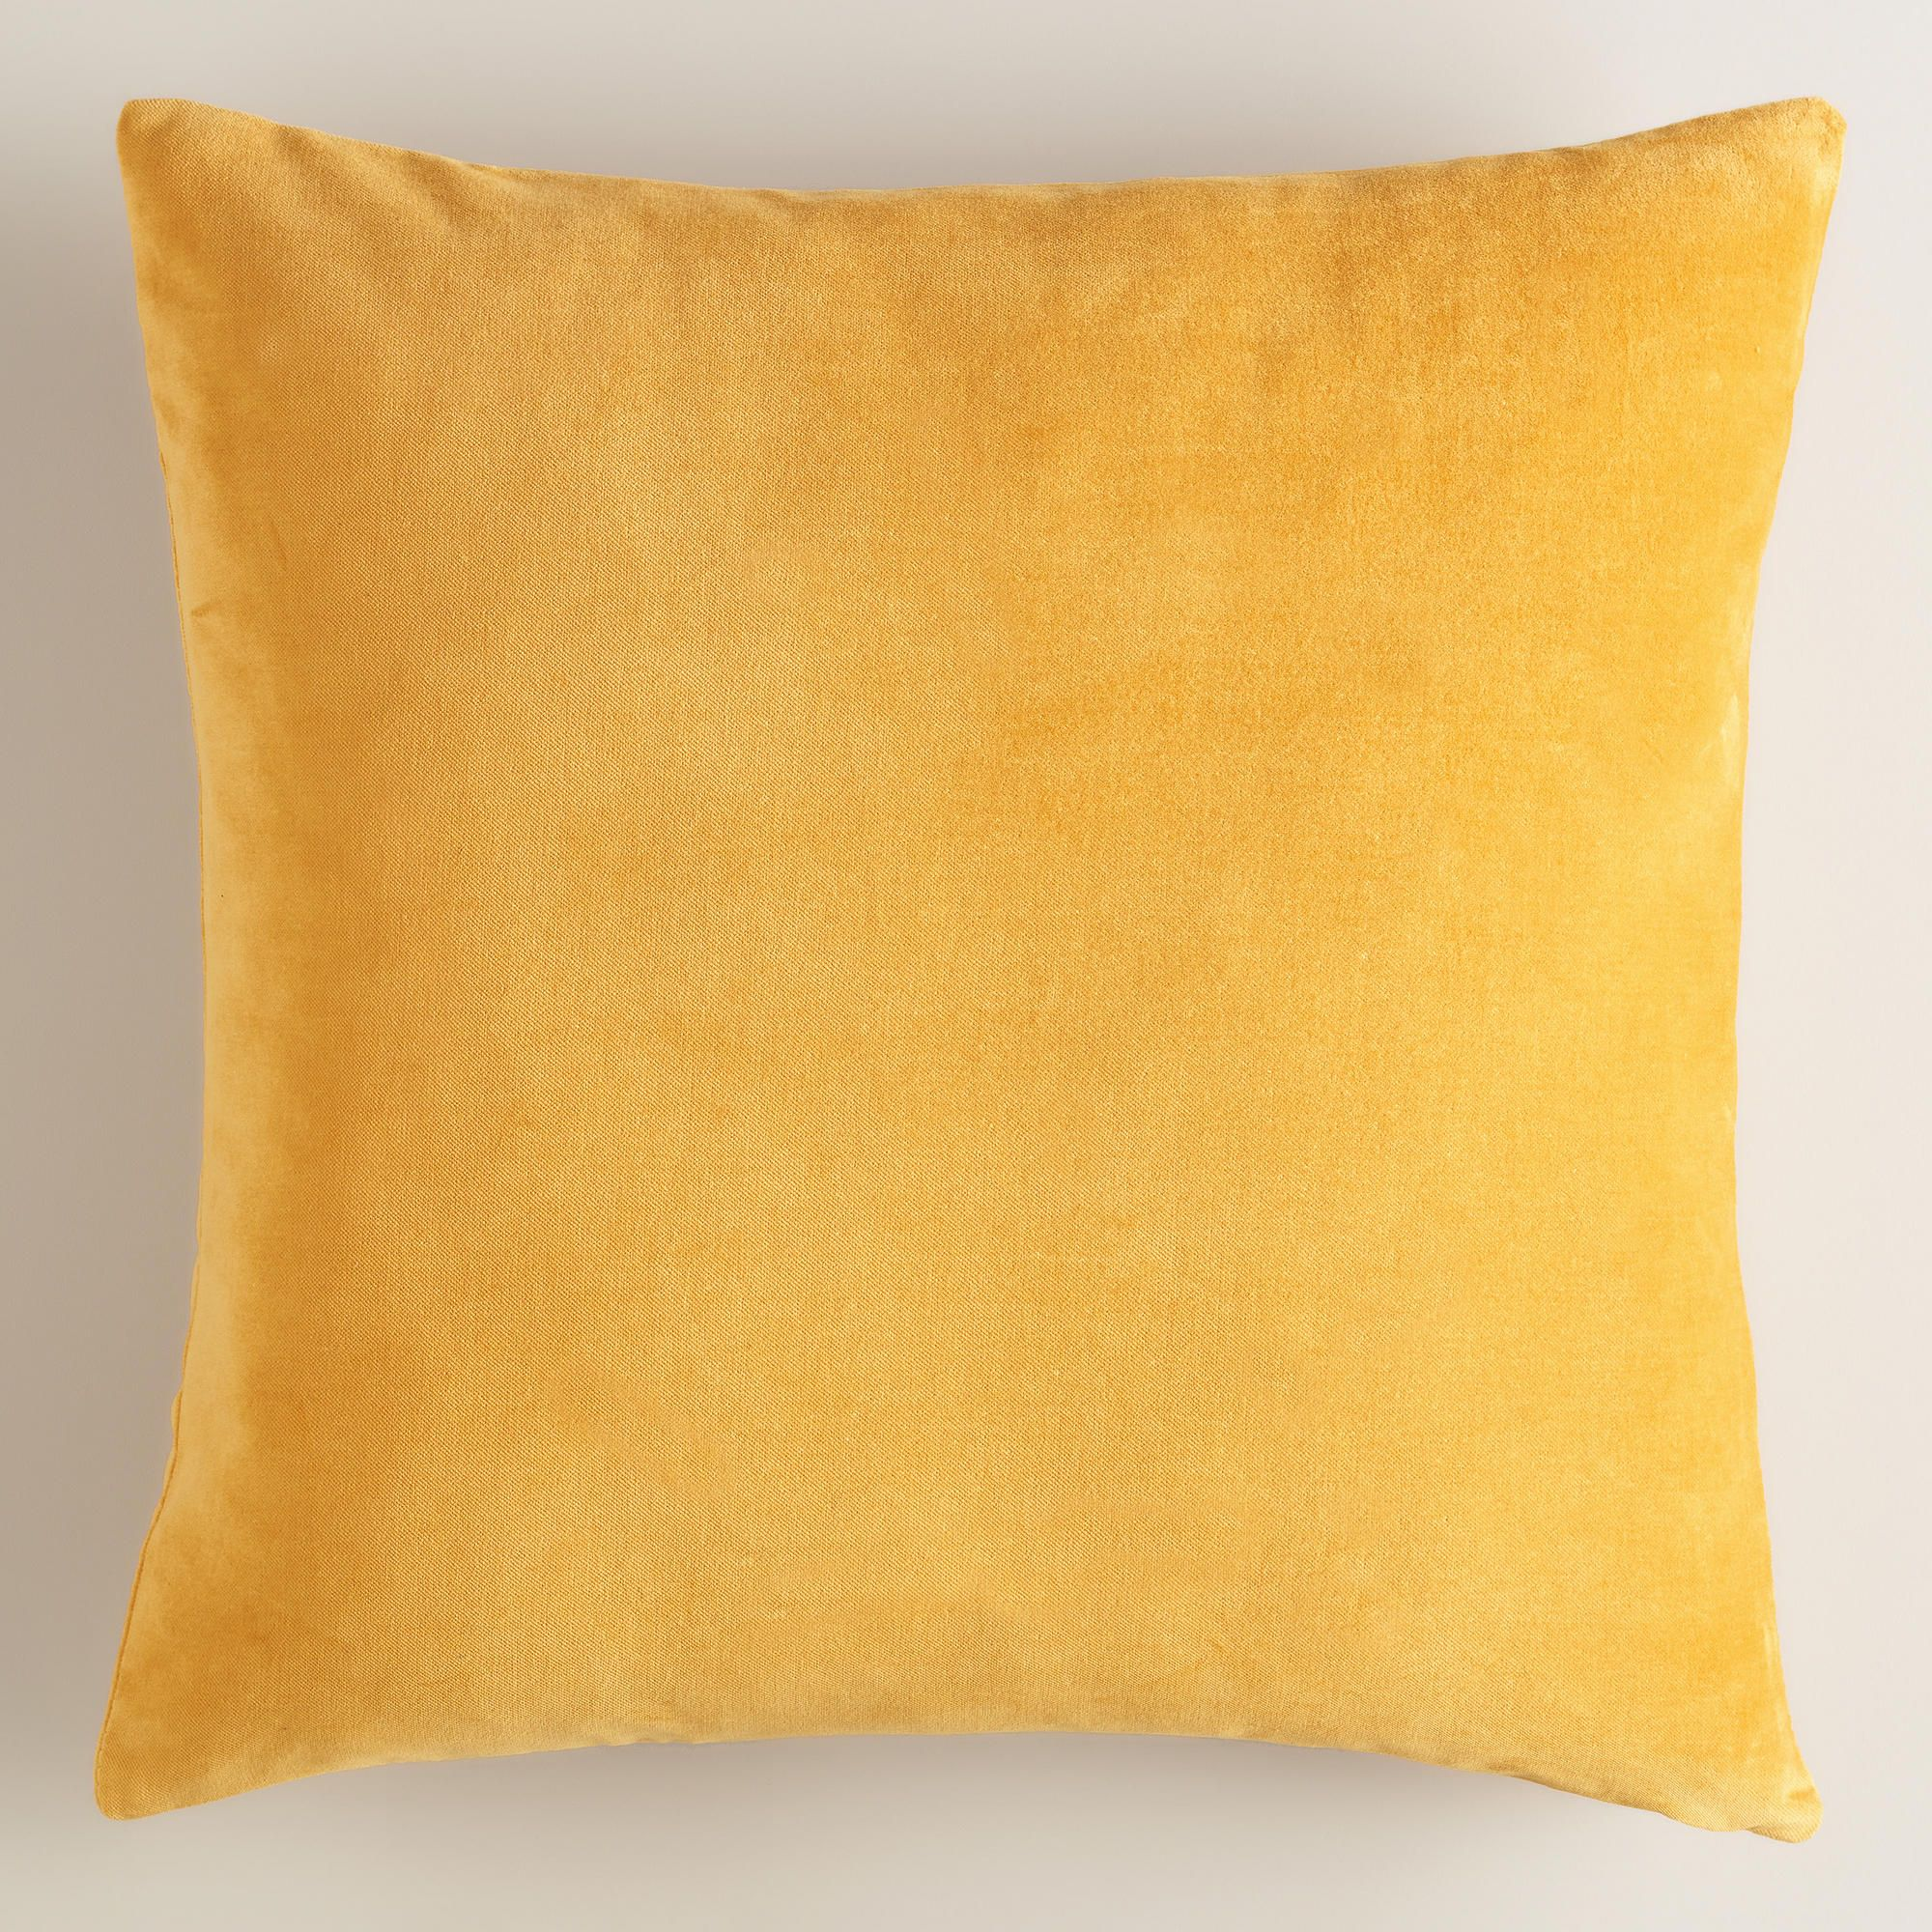 Mustard Yellow Velvet Throw Pillow World Market Breakfast Nook Yellow Throw Pillows Throw Pillows Bedroom Throw Pillows